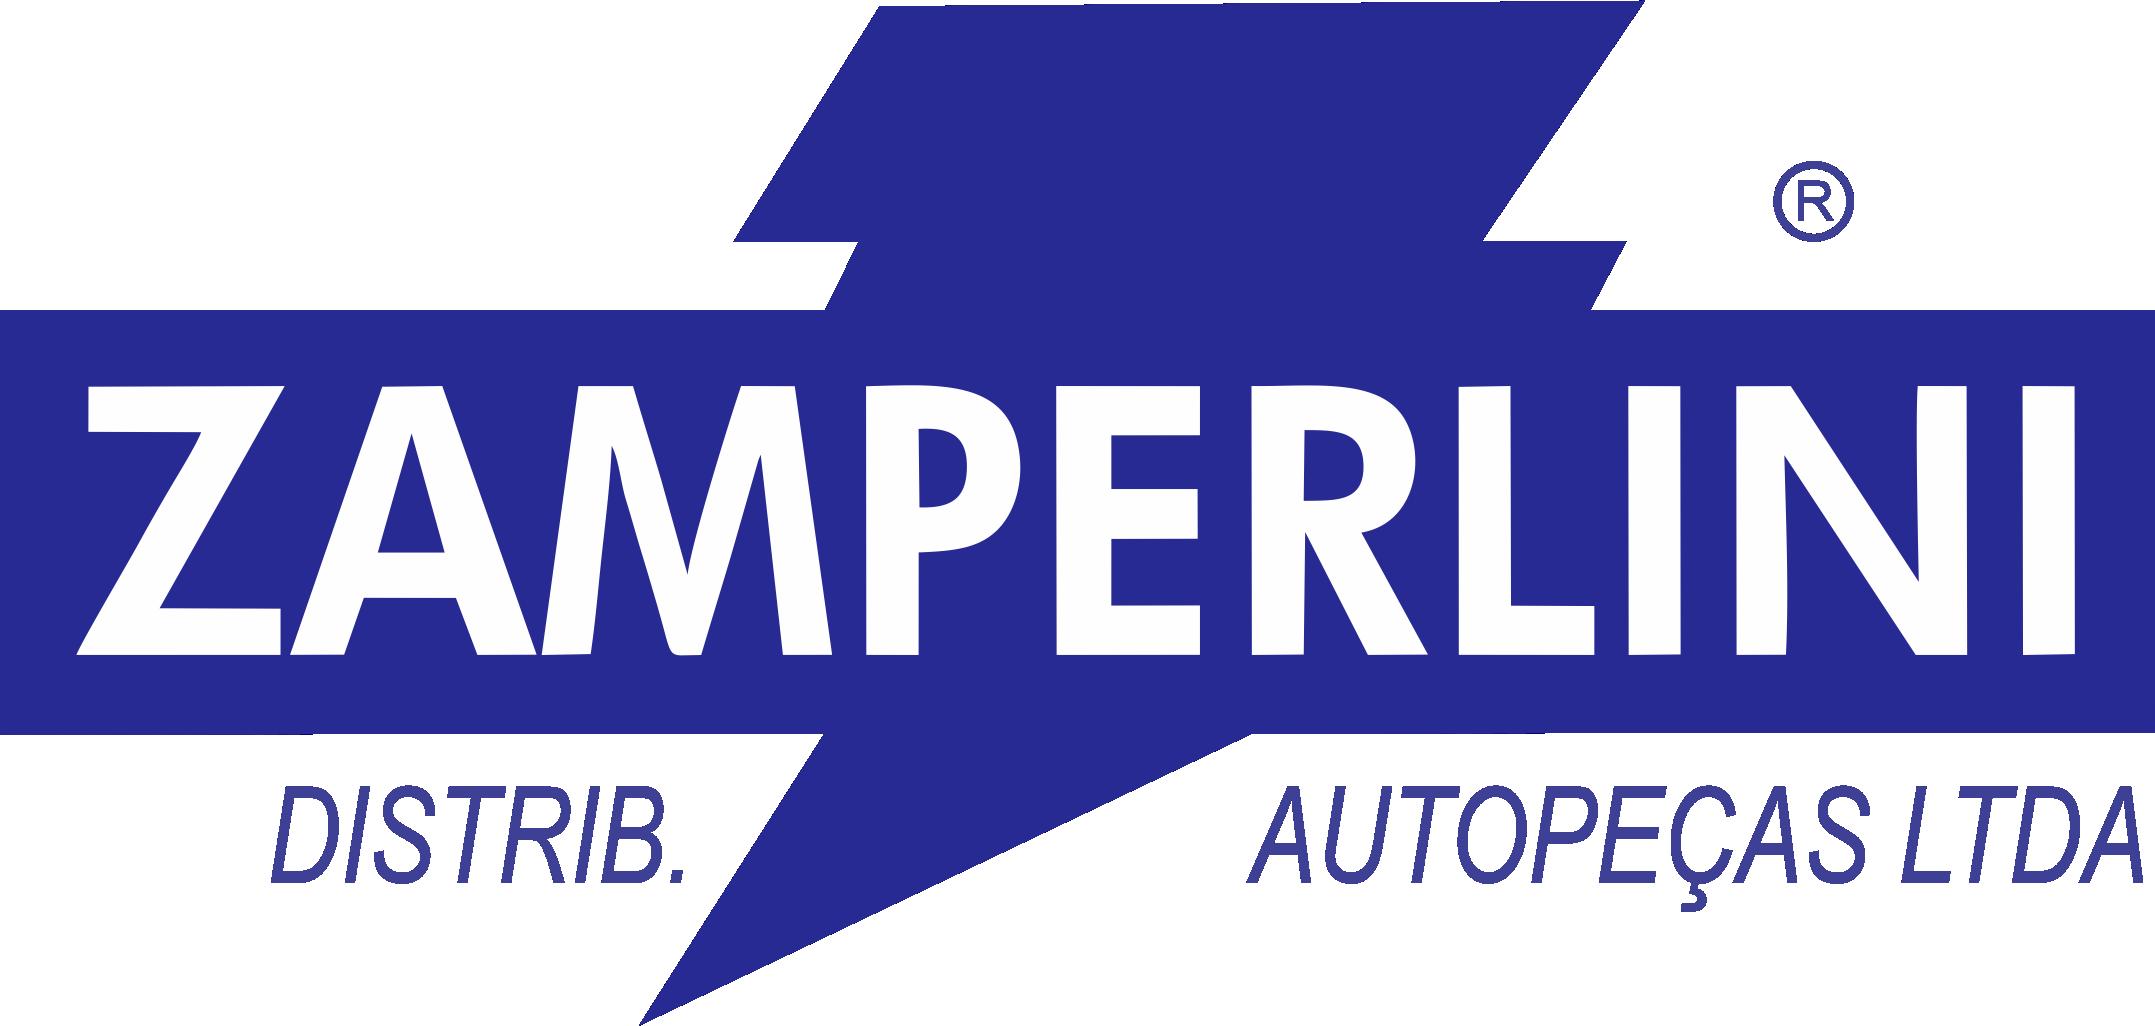 Zamperlini